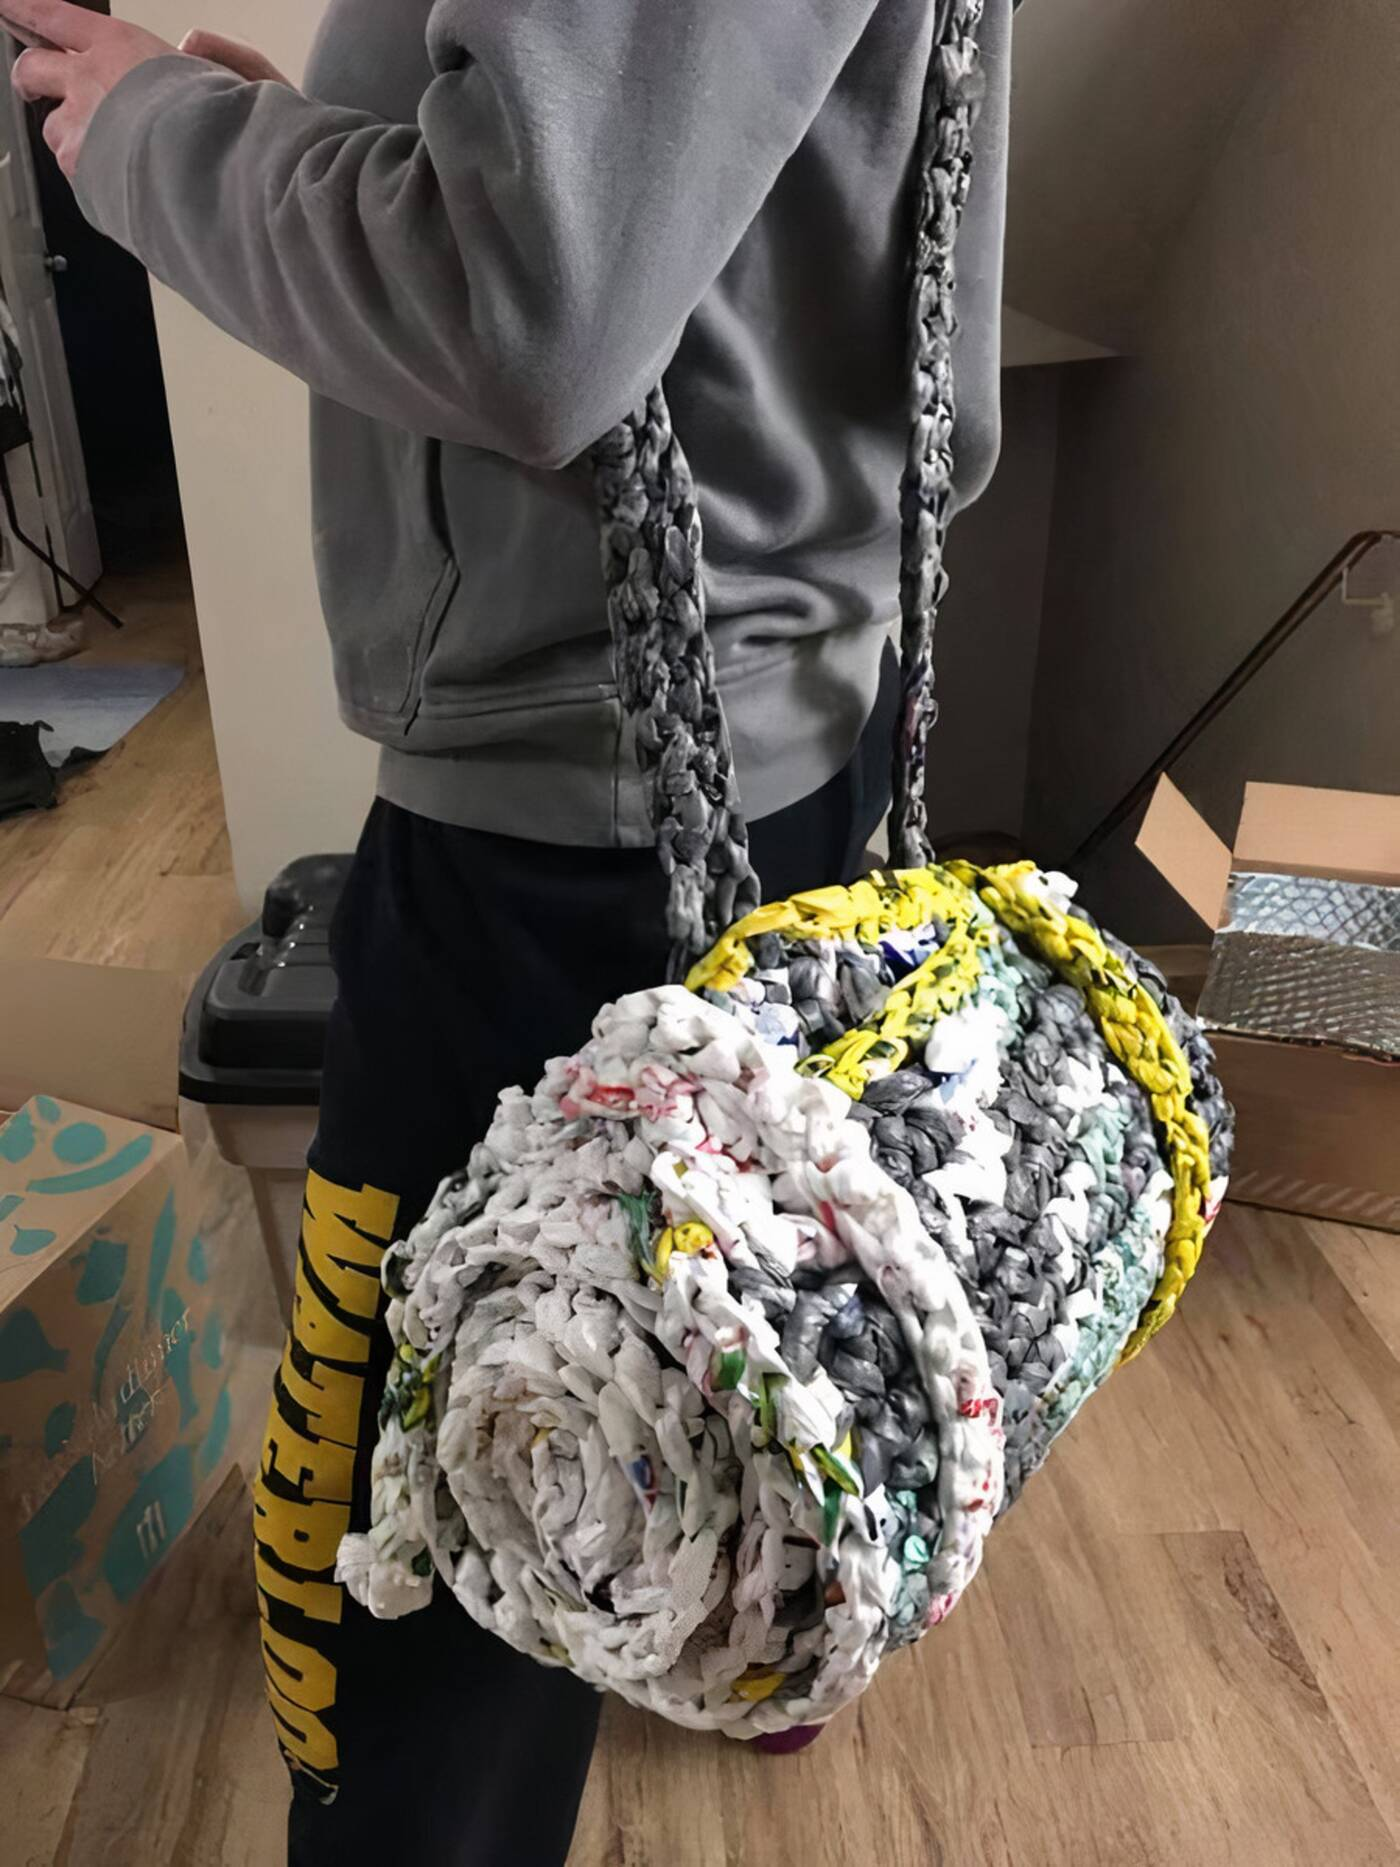 bags to sleeping mats